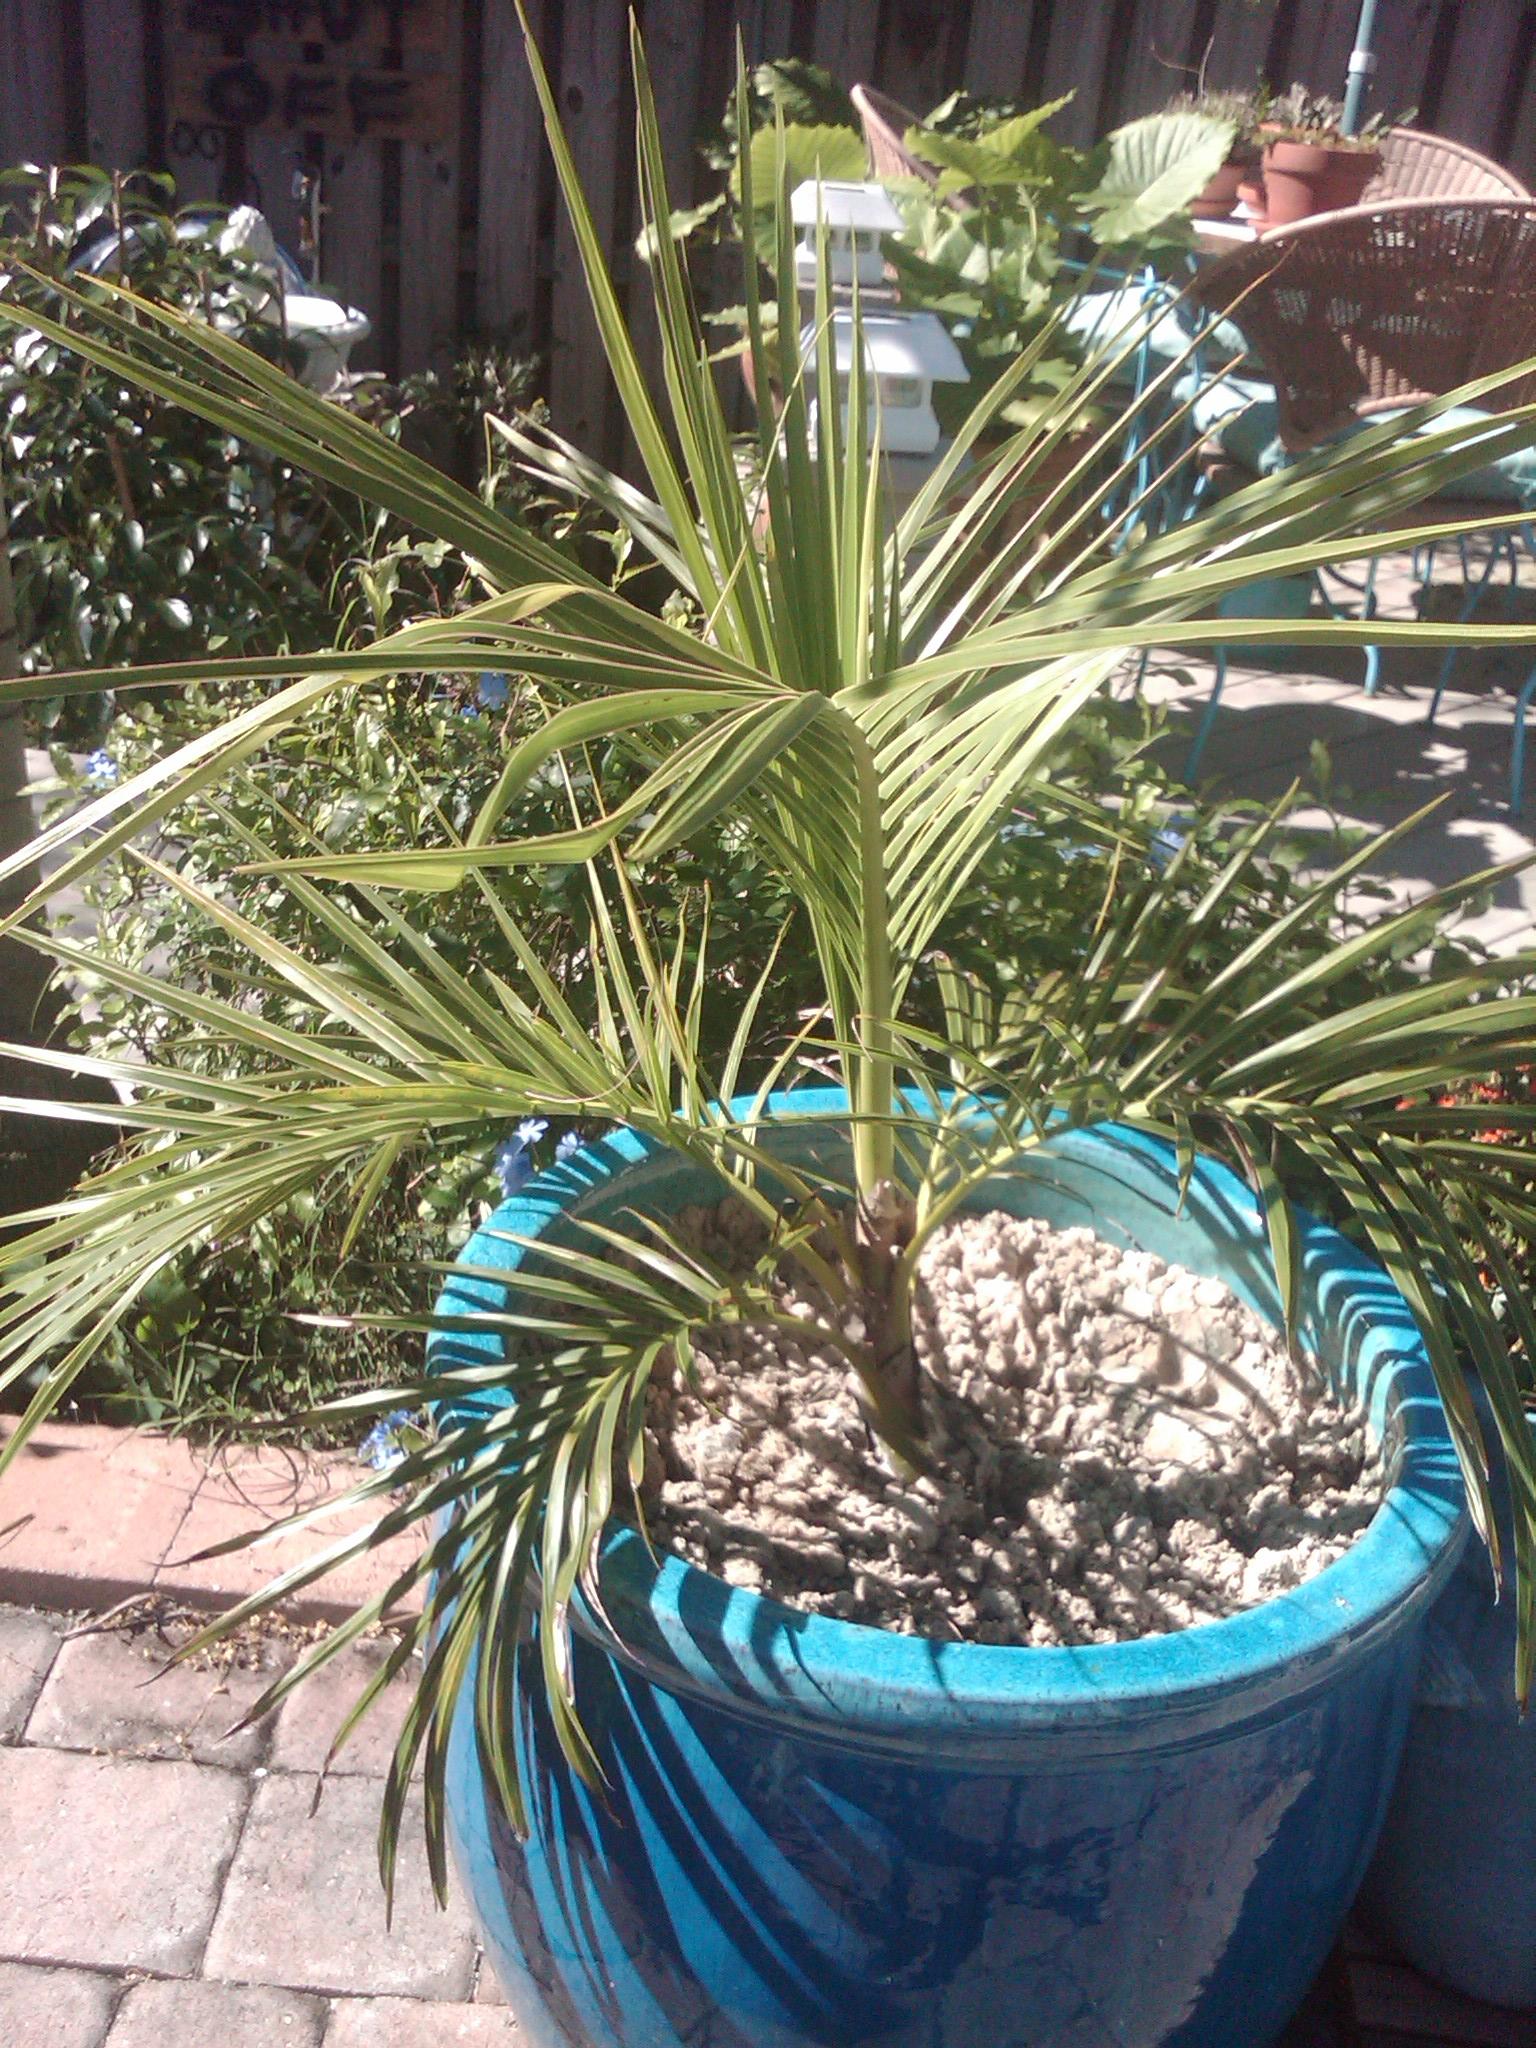 Florida frost gardening tip!